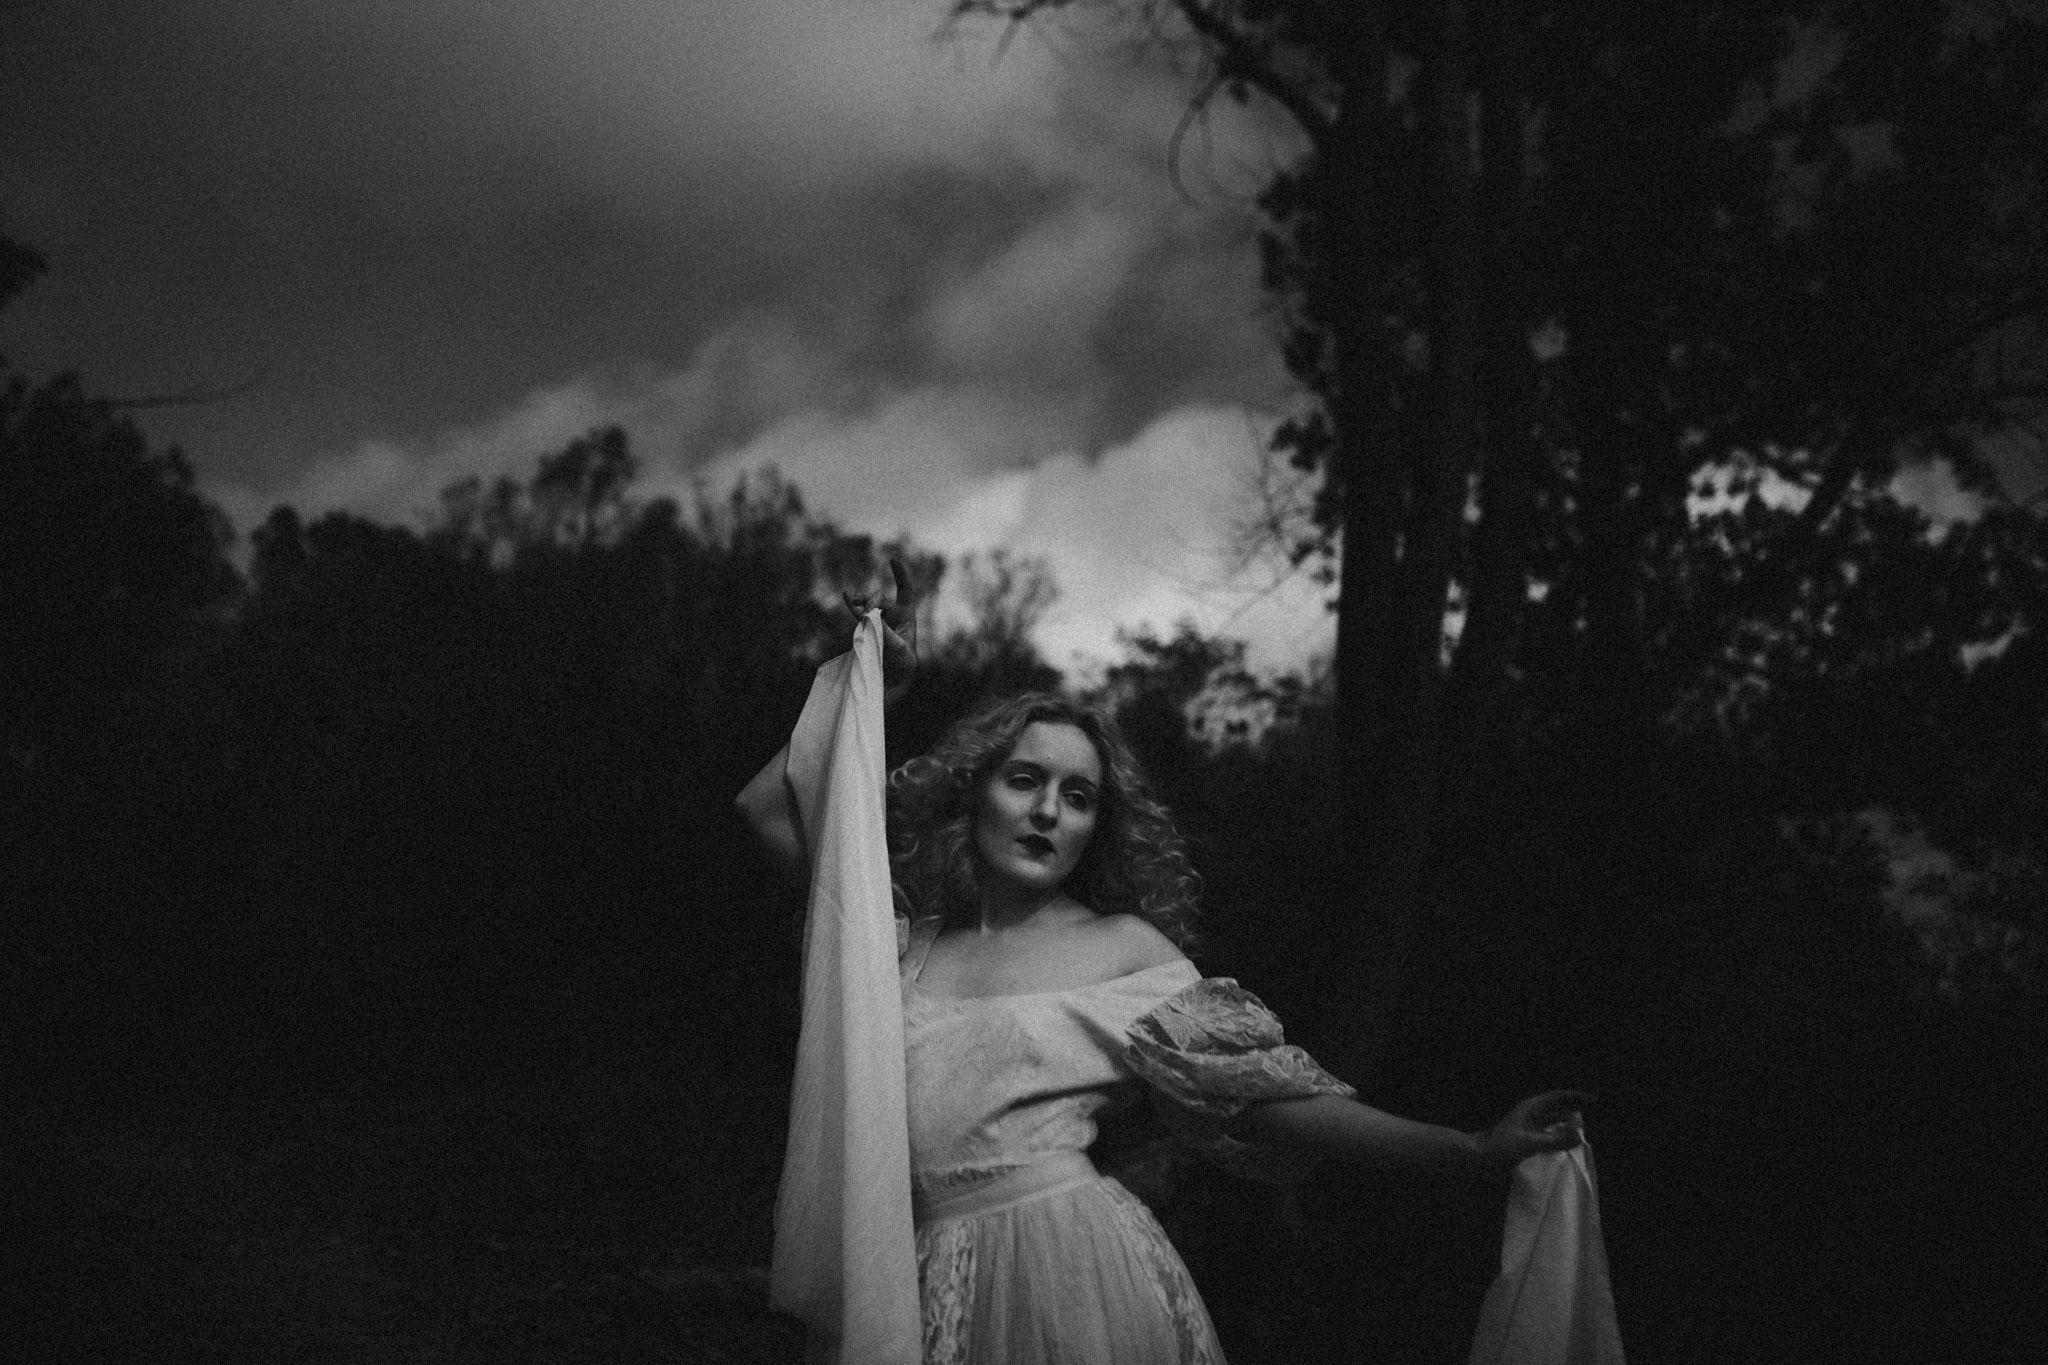 pale-witch-223fb.jpg